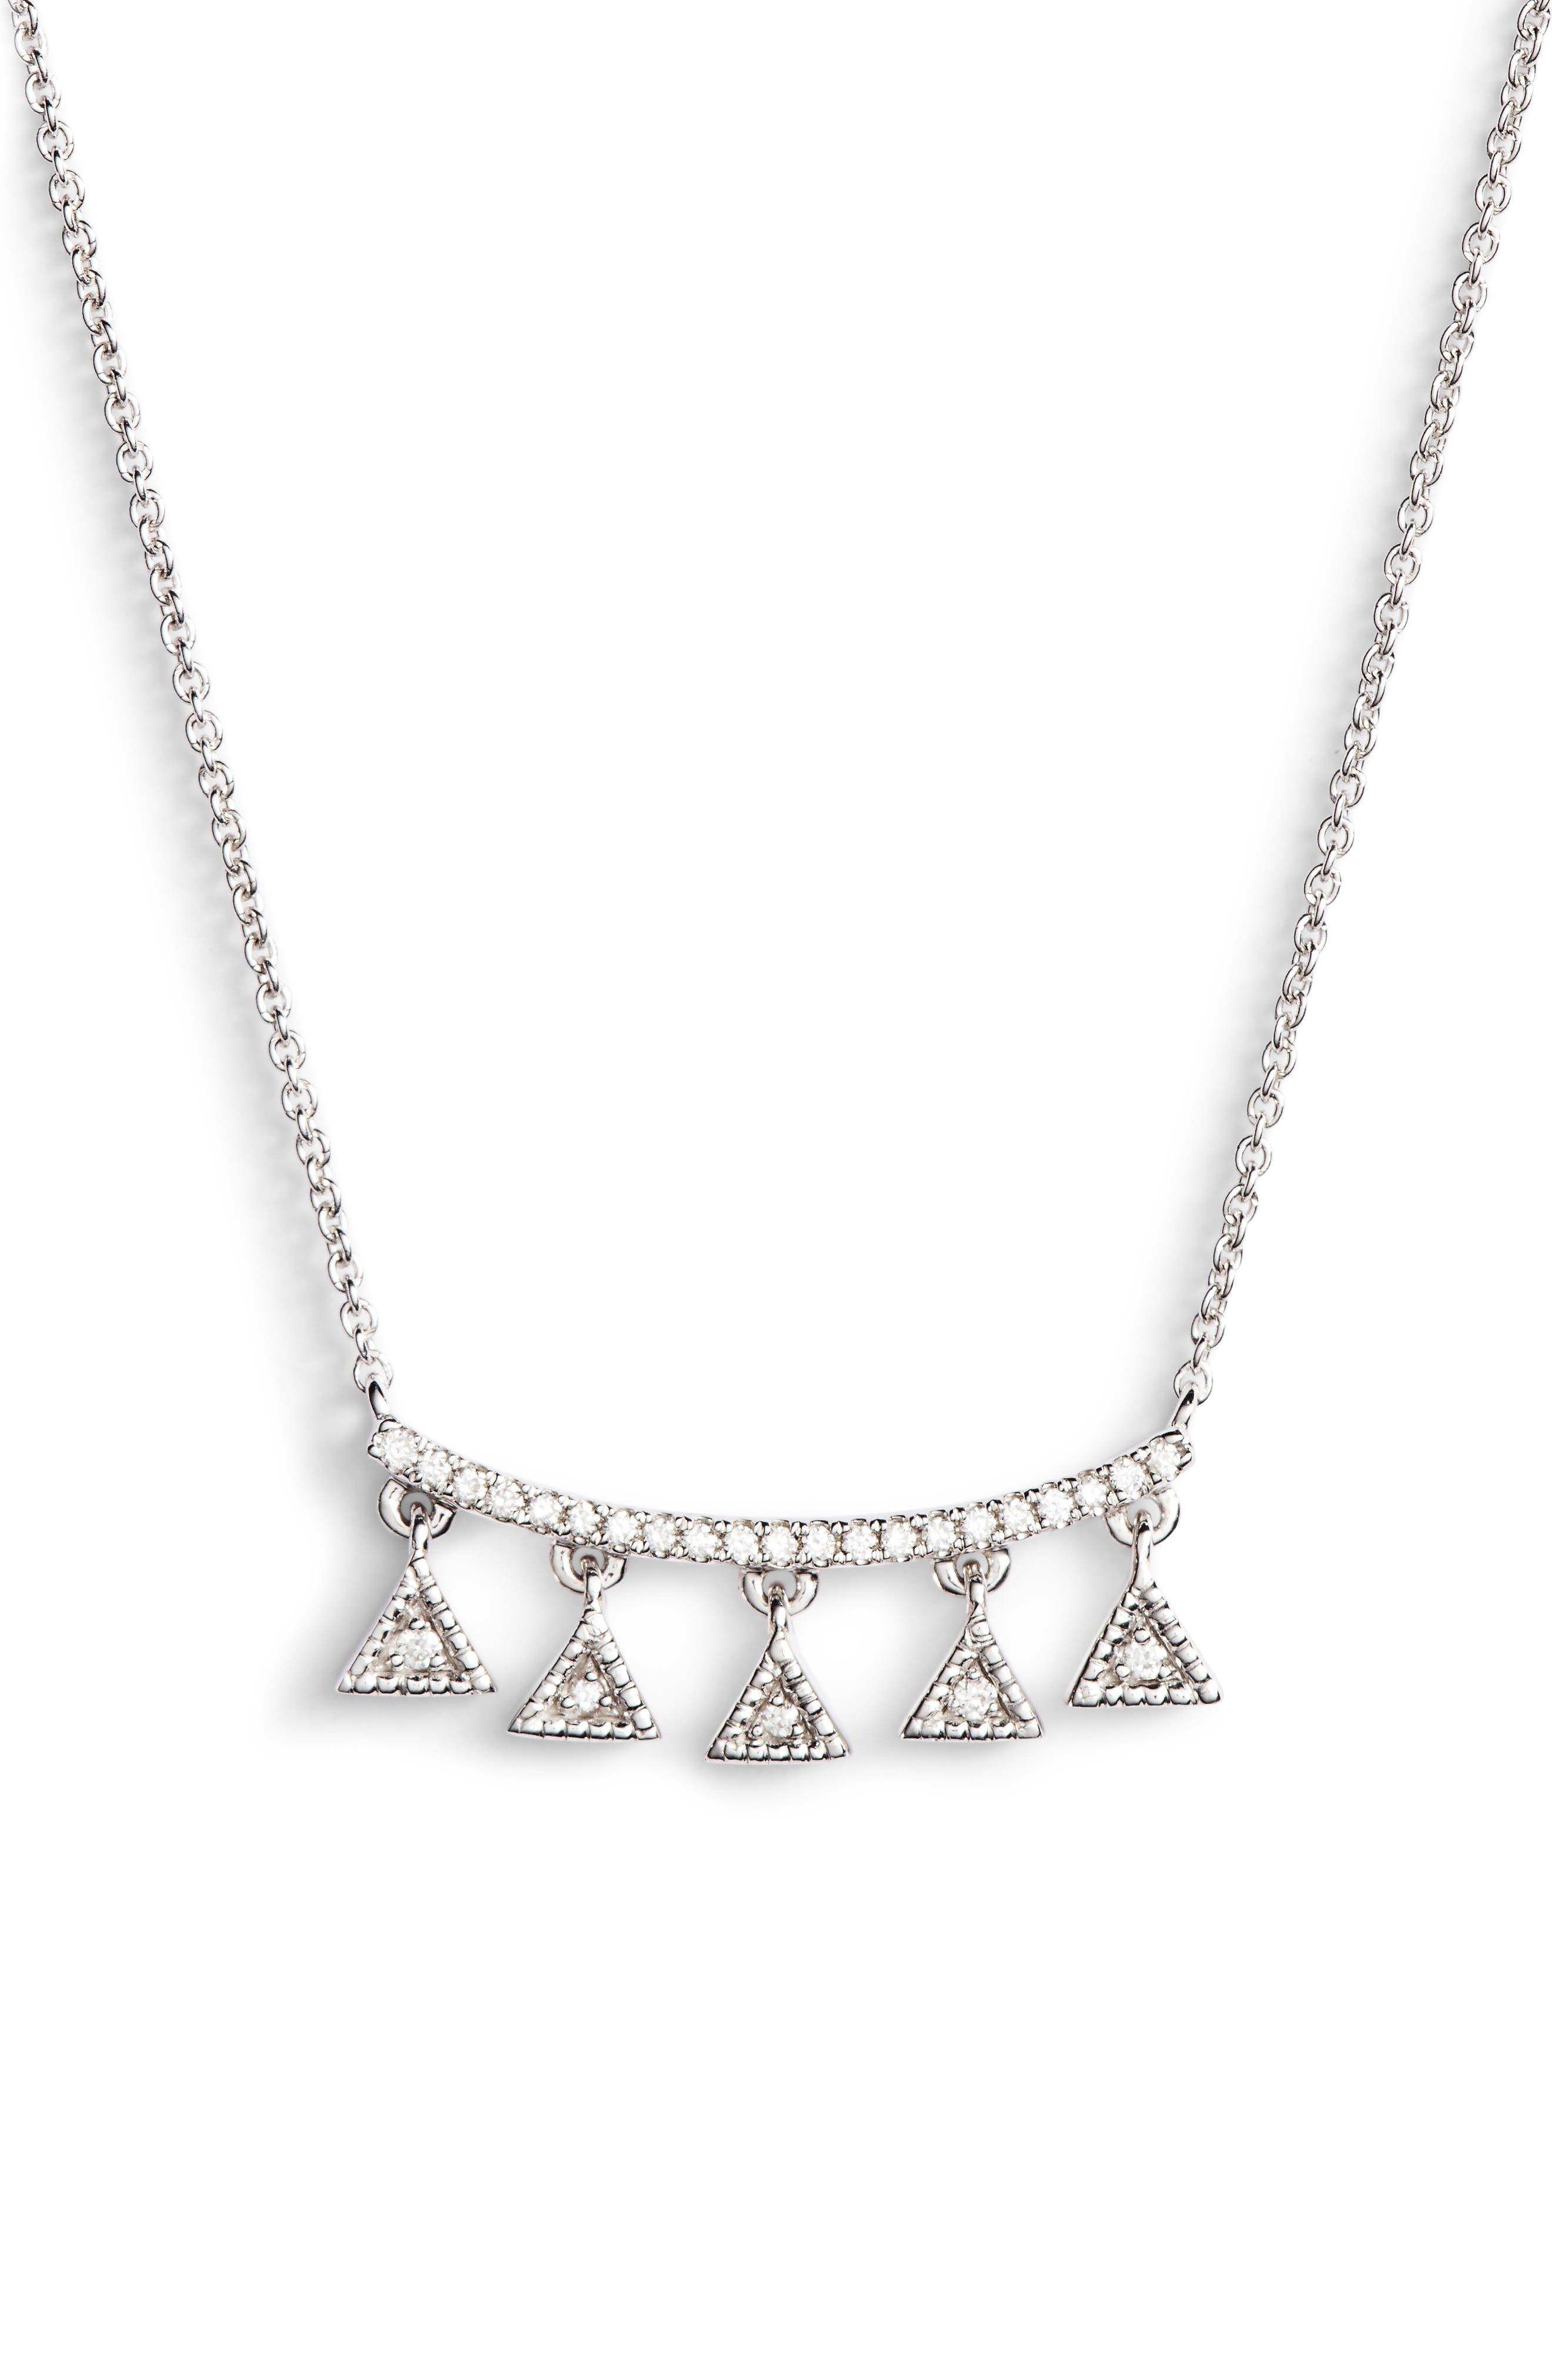 Alternate Image 1 Selected - Dana Rebecca Designs Emily Sarah Diamond Pendant Necklace